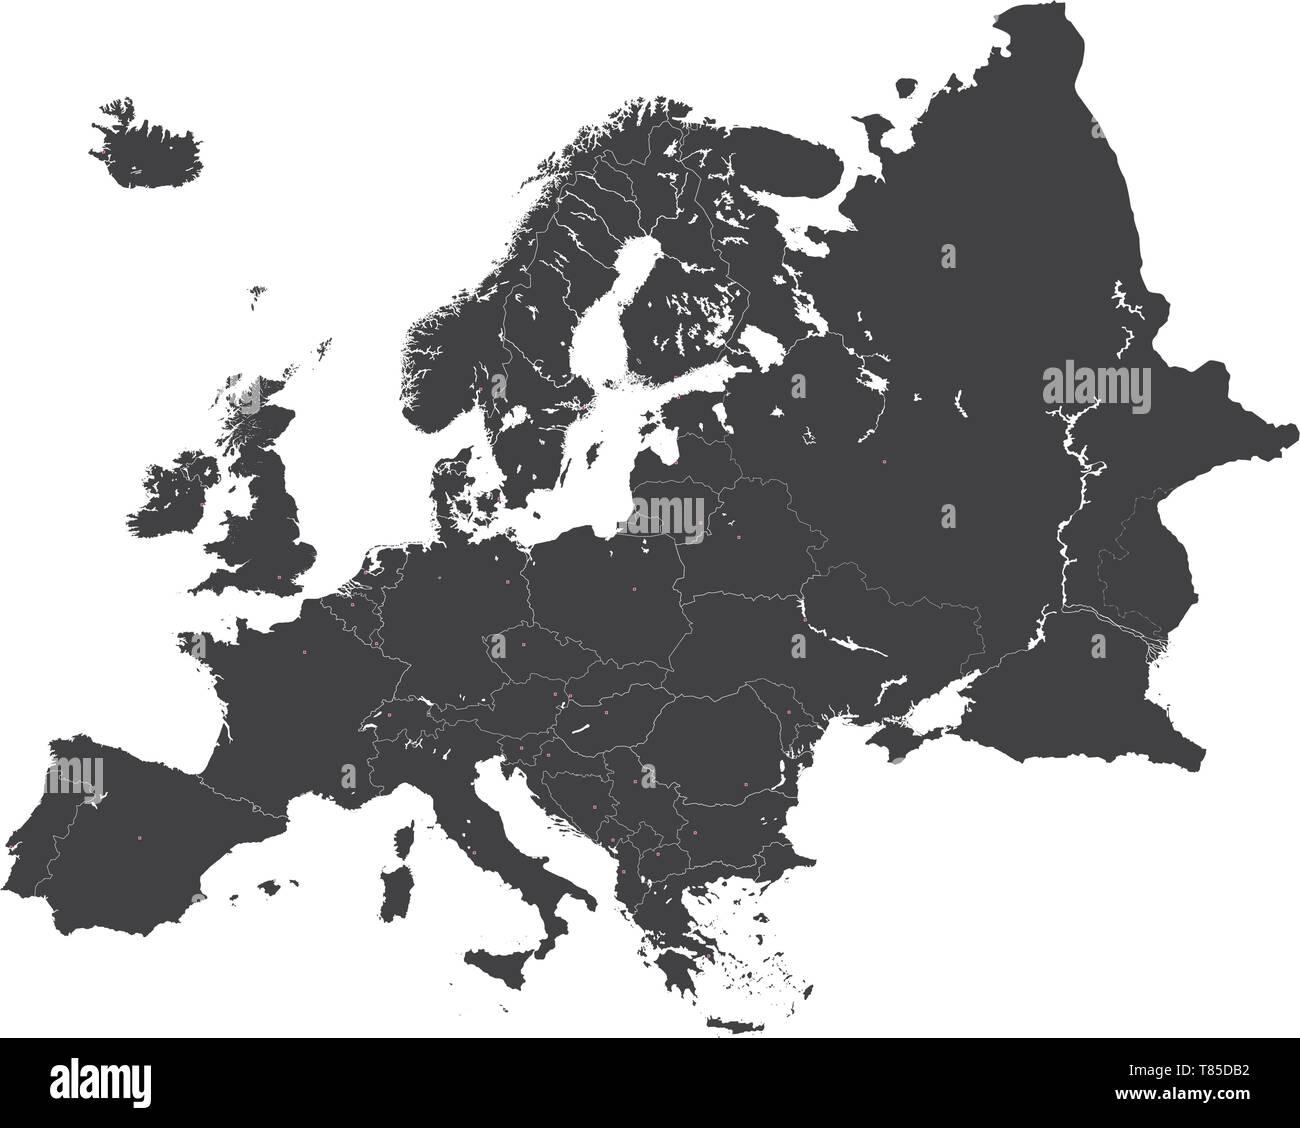 Europe vector high detailed political map Stock Vector Art ...